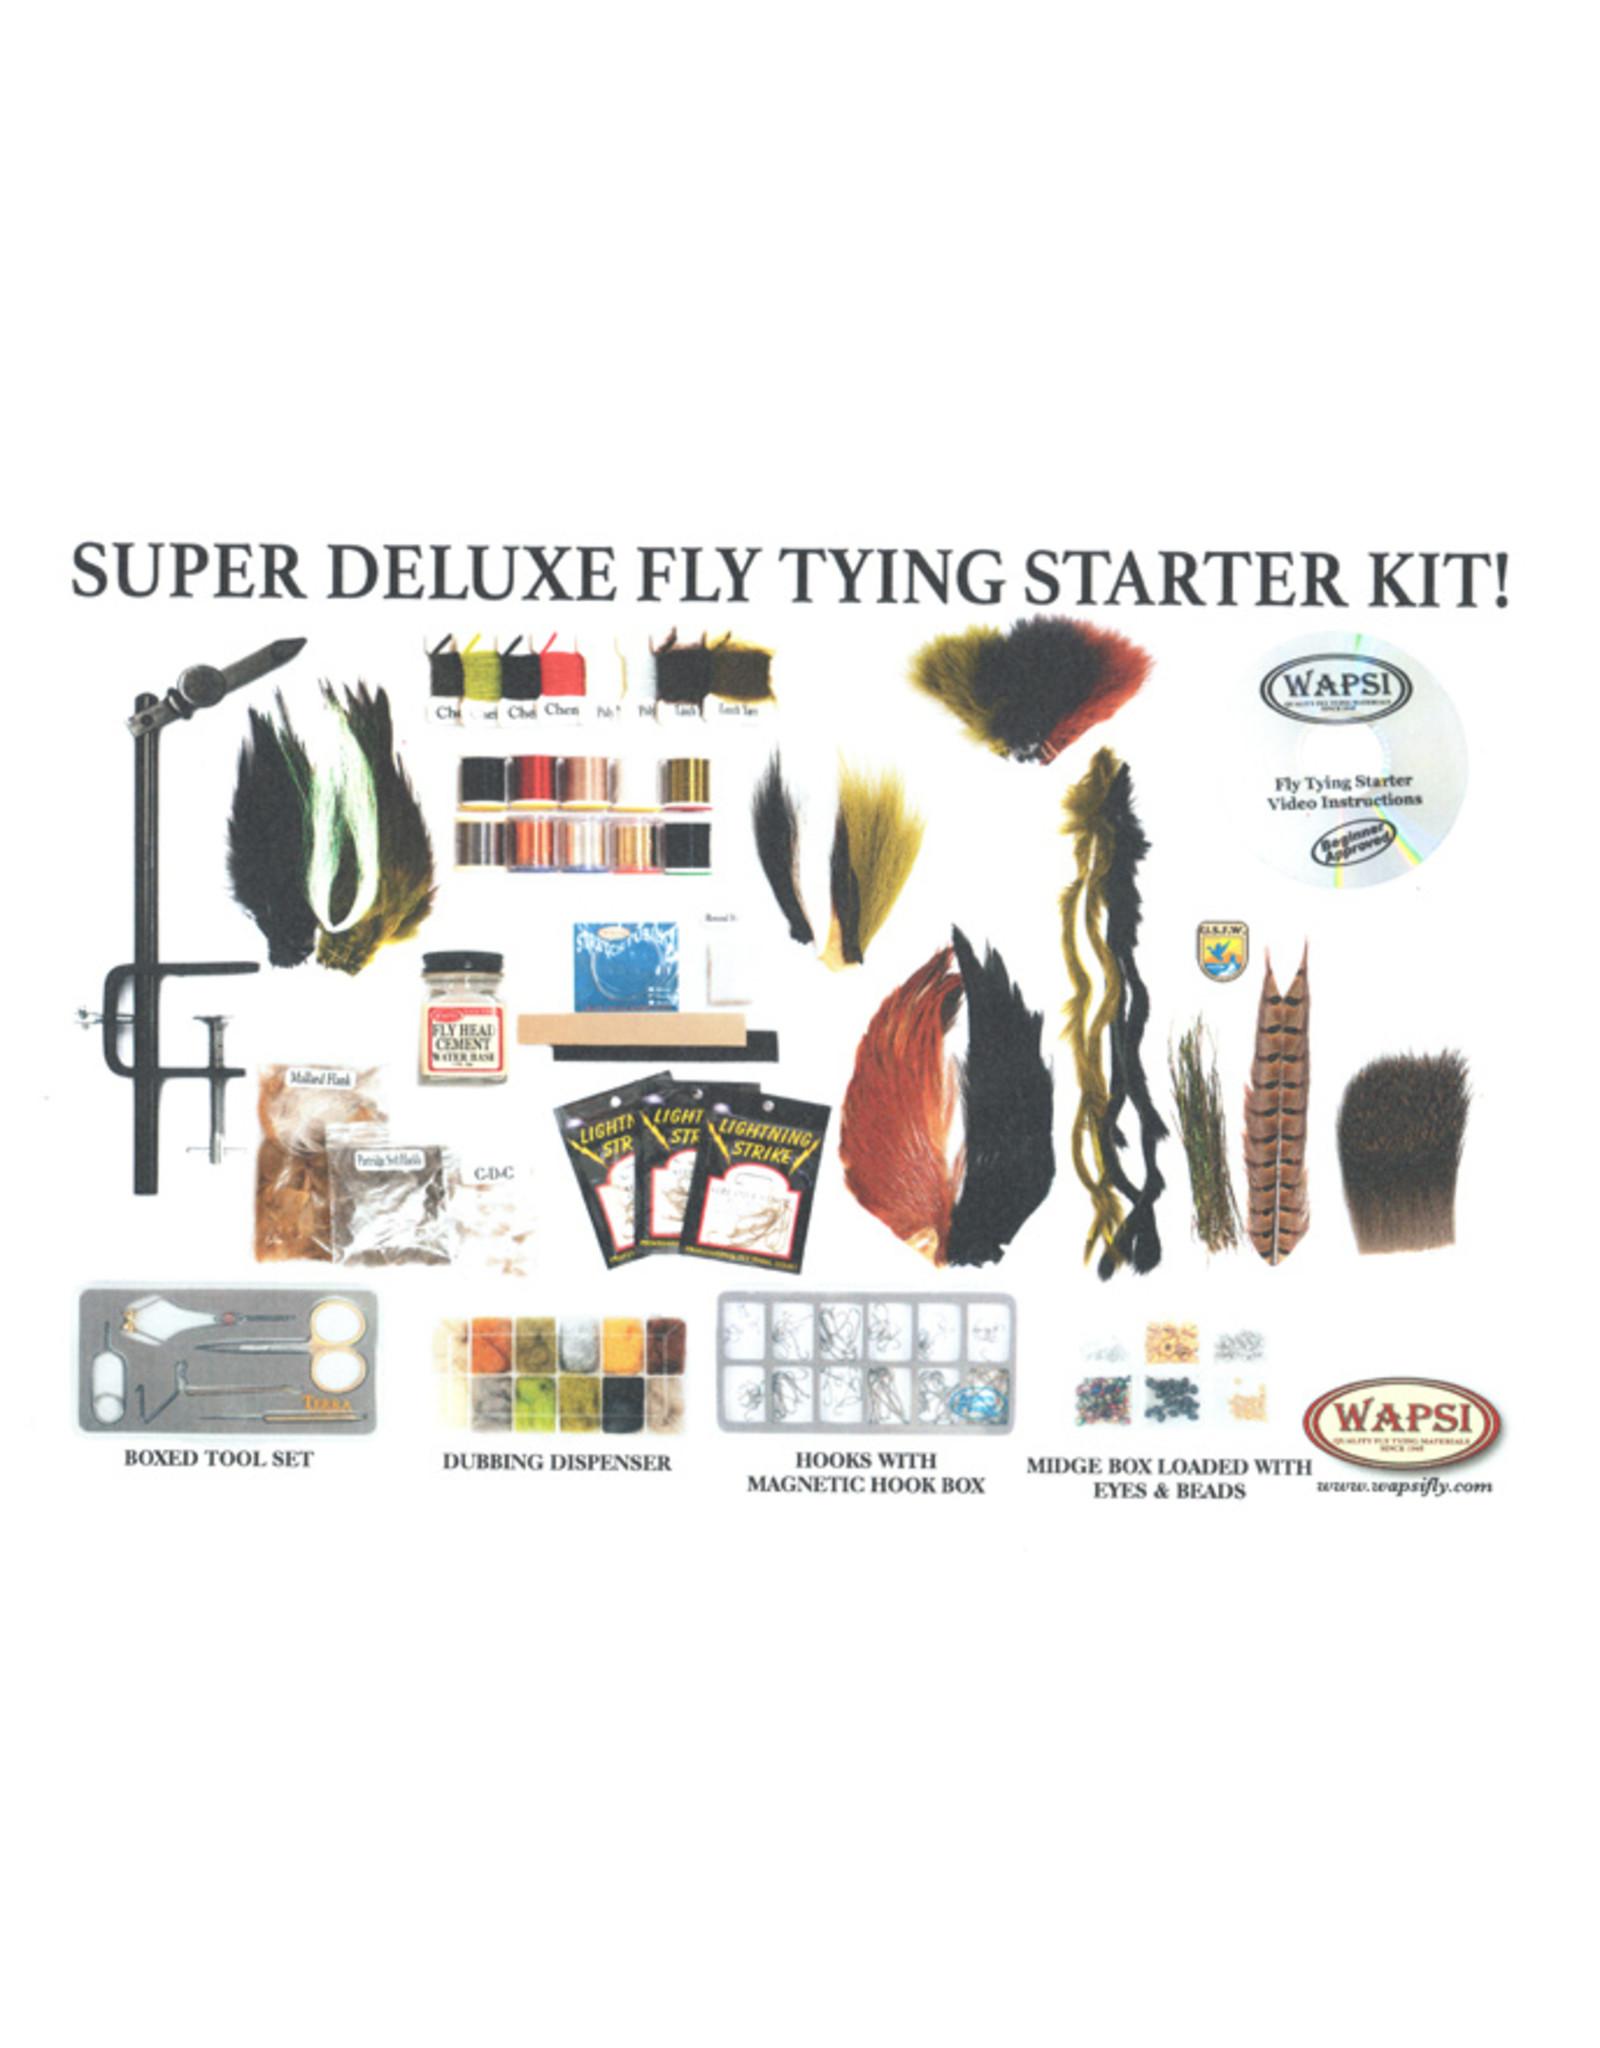 Wapsi Wapsi - Super Deluxe Fly Tying Starter Kit